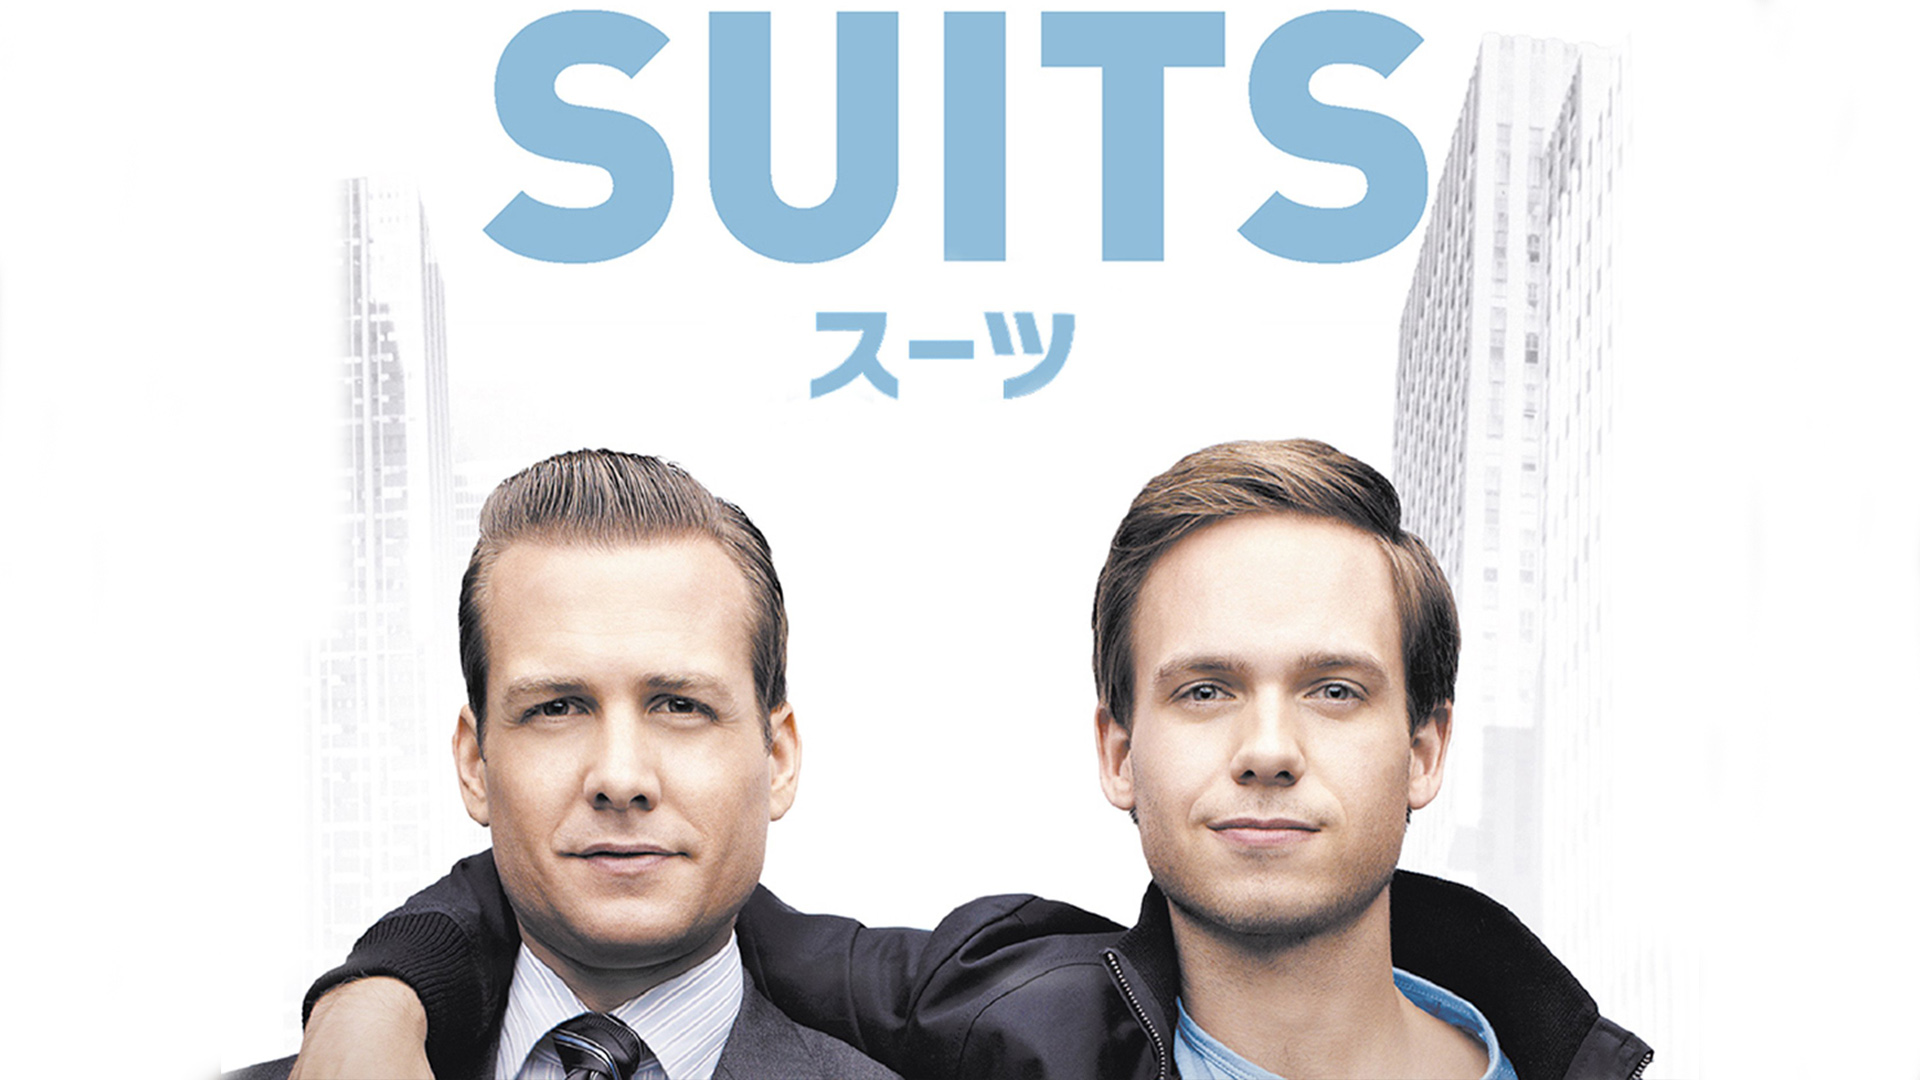 SUITS/スーツ シーズン1 (字幕版)